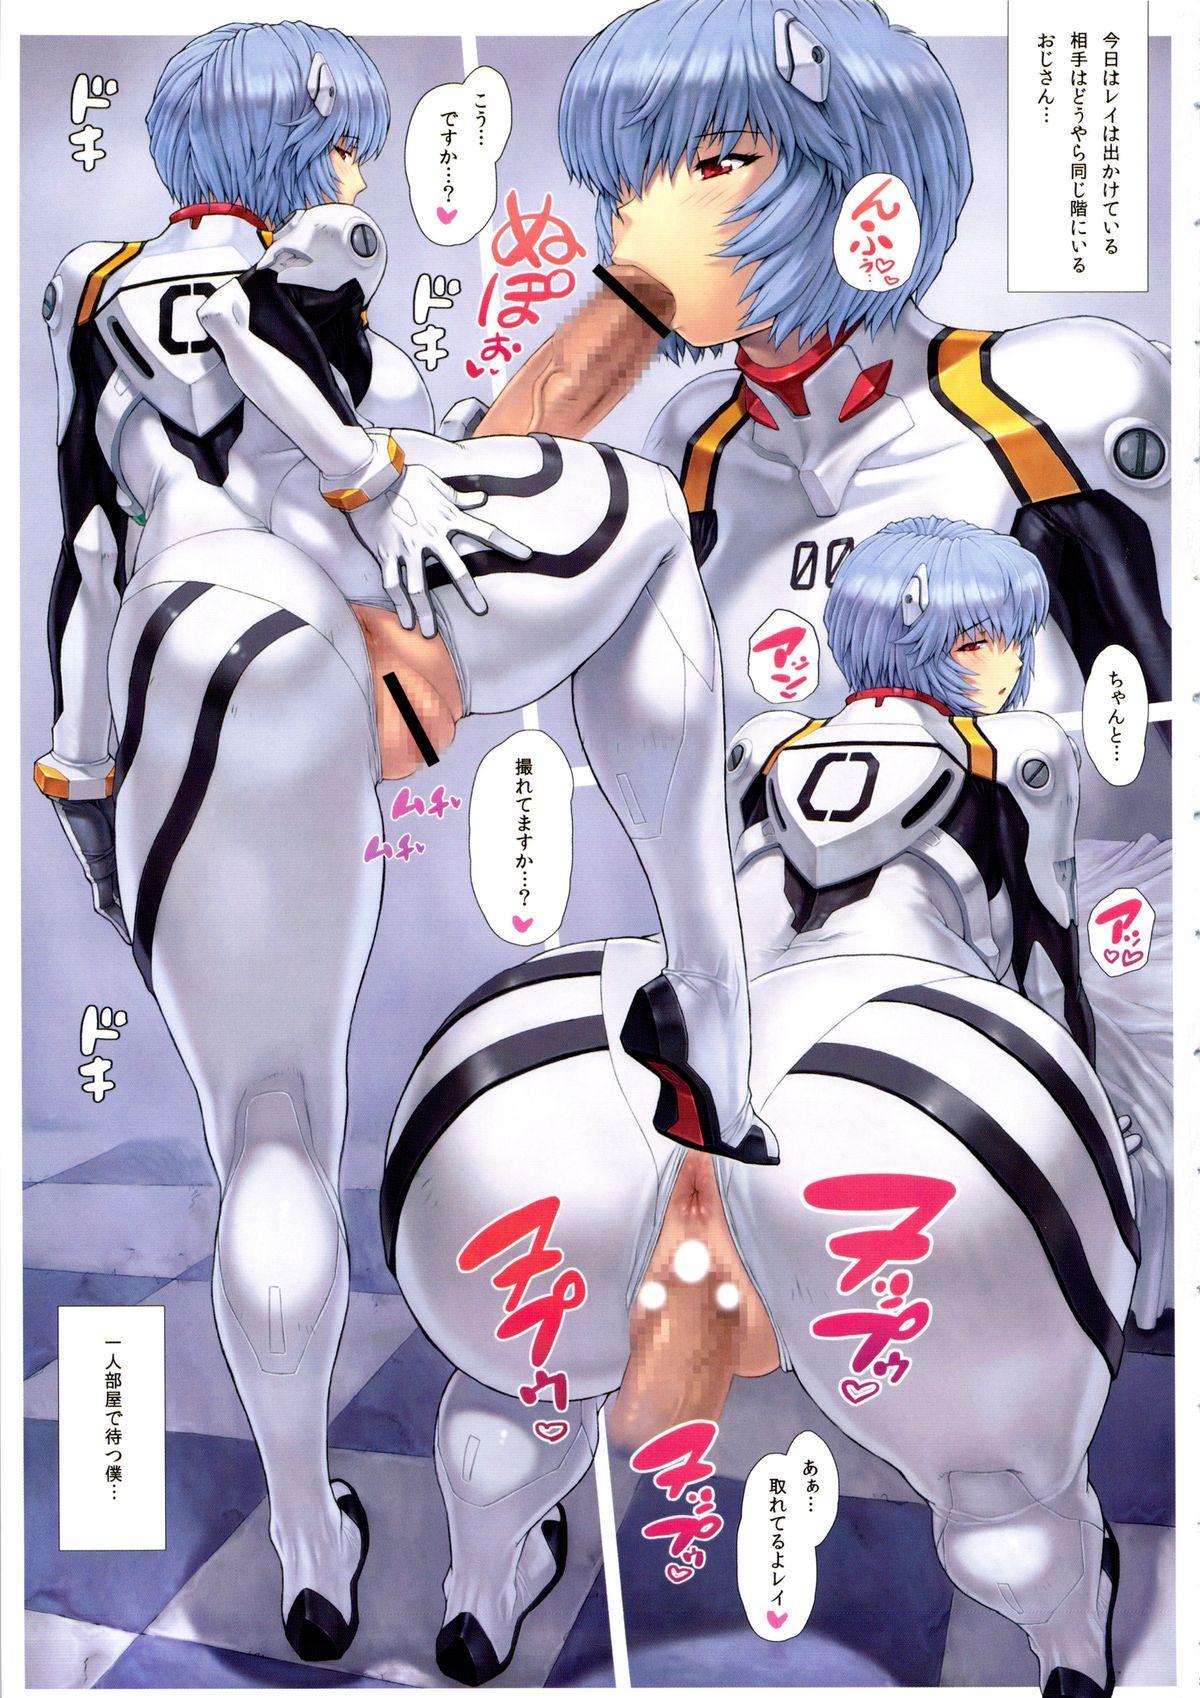 Ayanami Dai 4 Kai + Omake Bon + Postcard 4